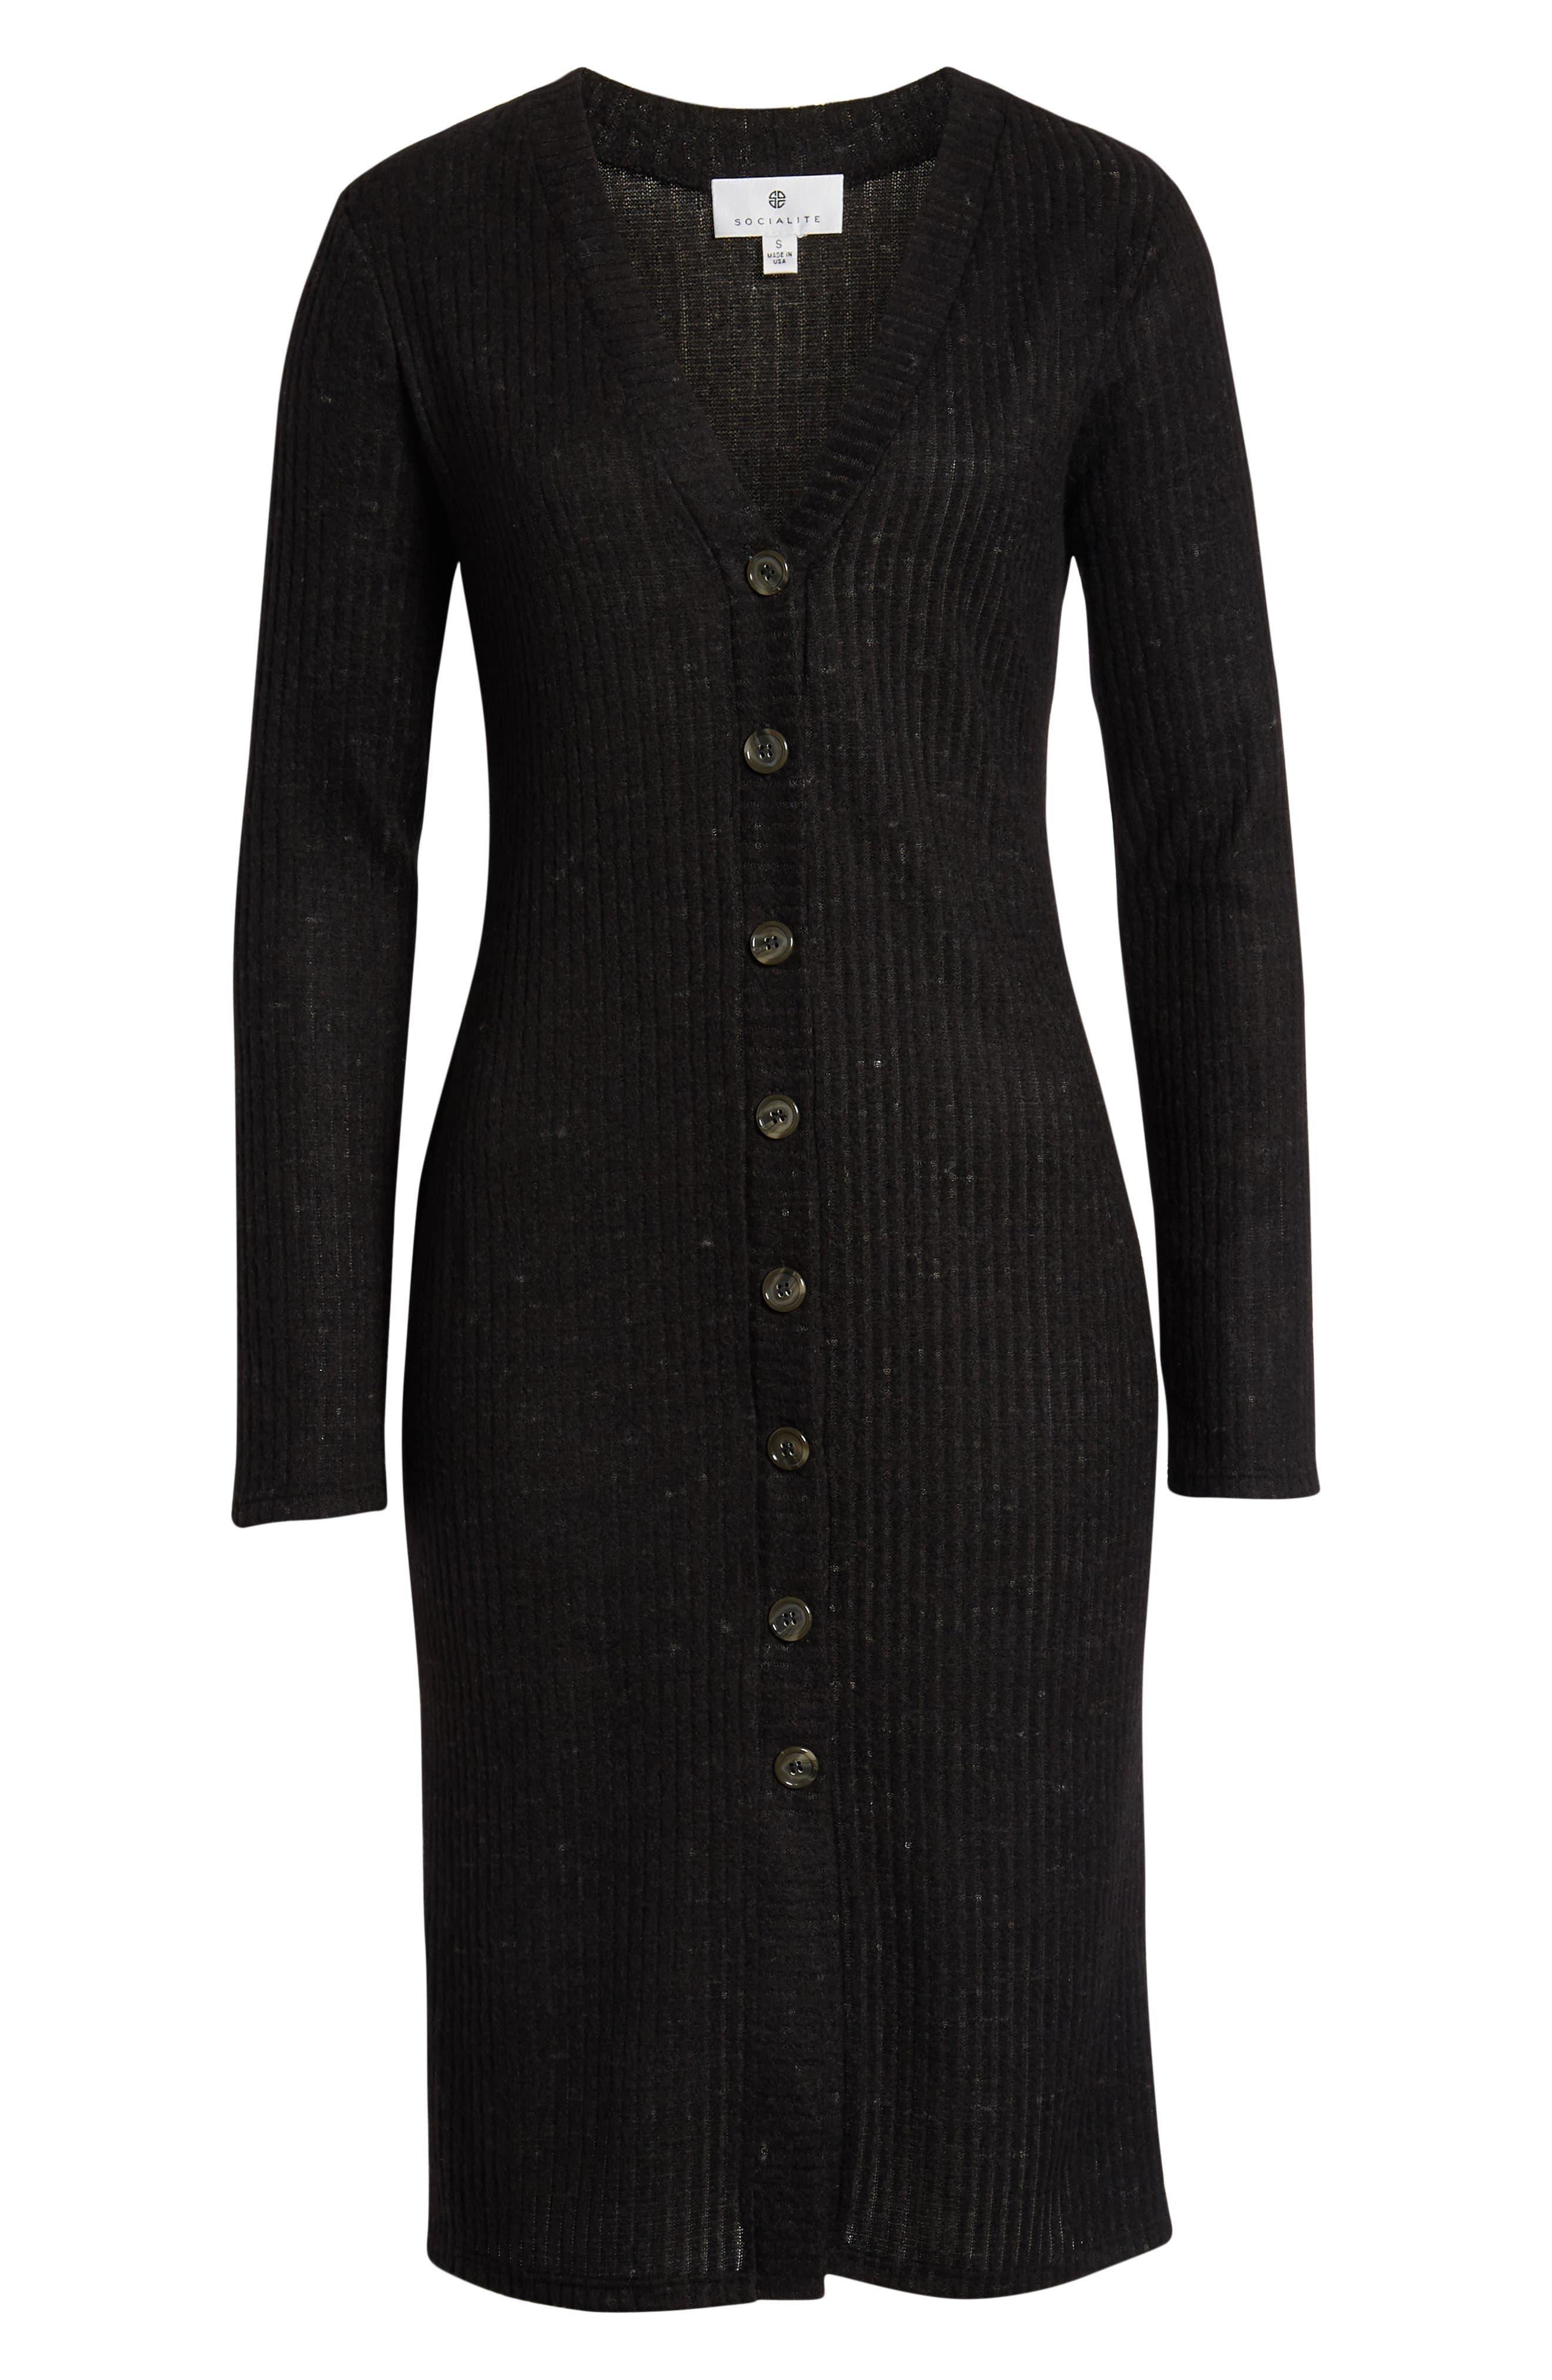 SOCIALITE,                             Sweater Dress,                             Alternate thumbnail 7, color,                             BLACK